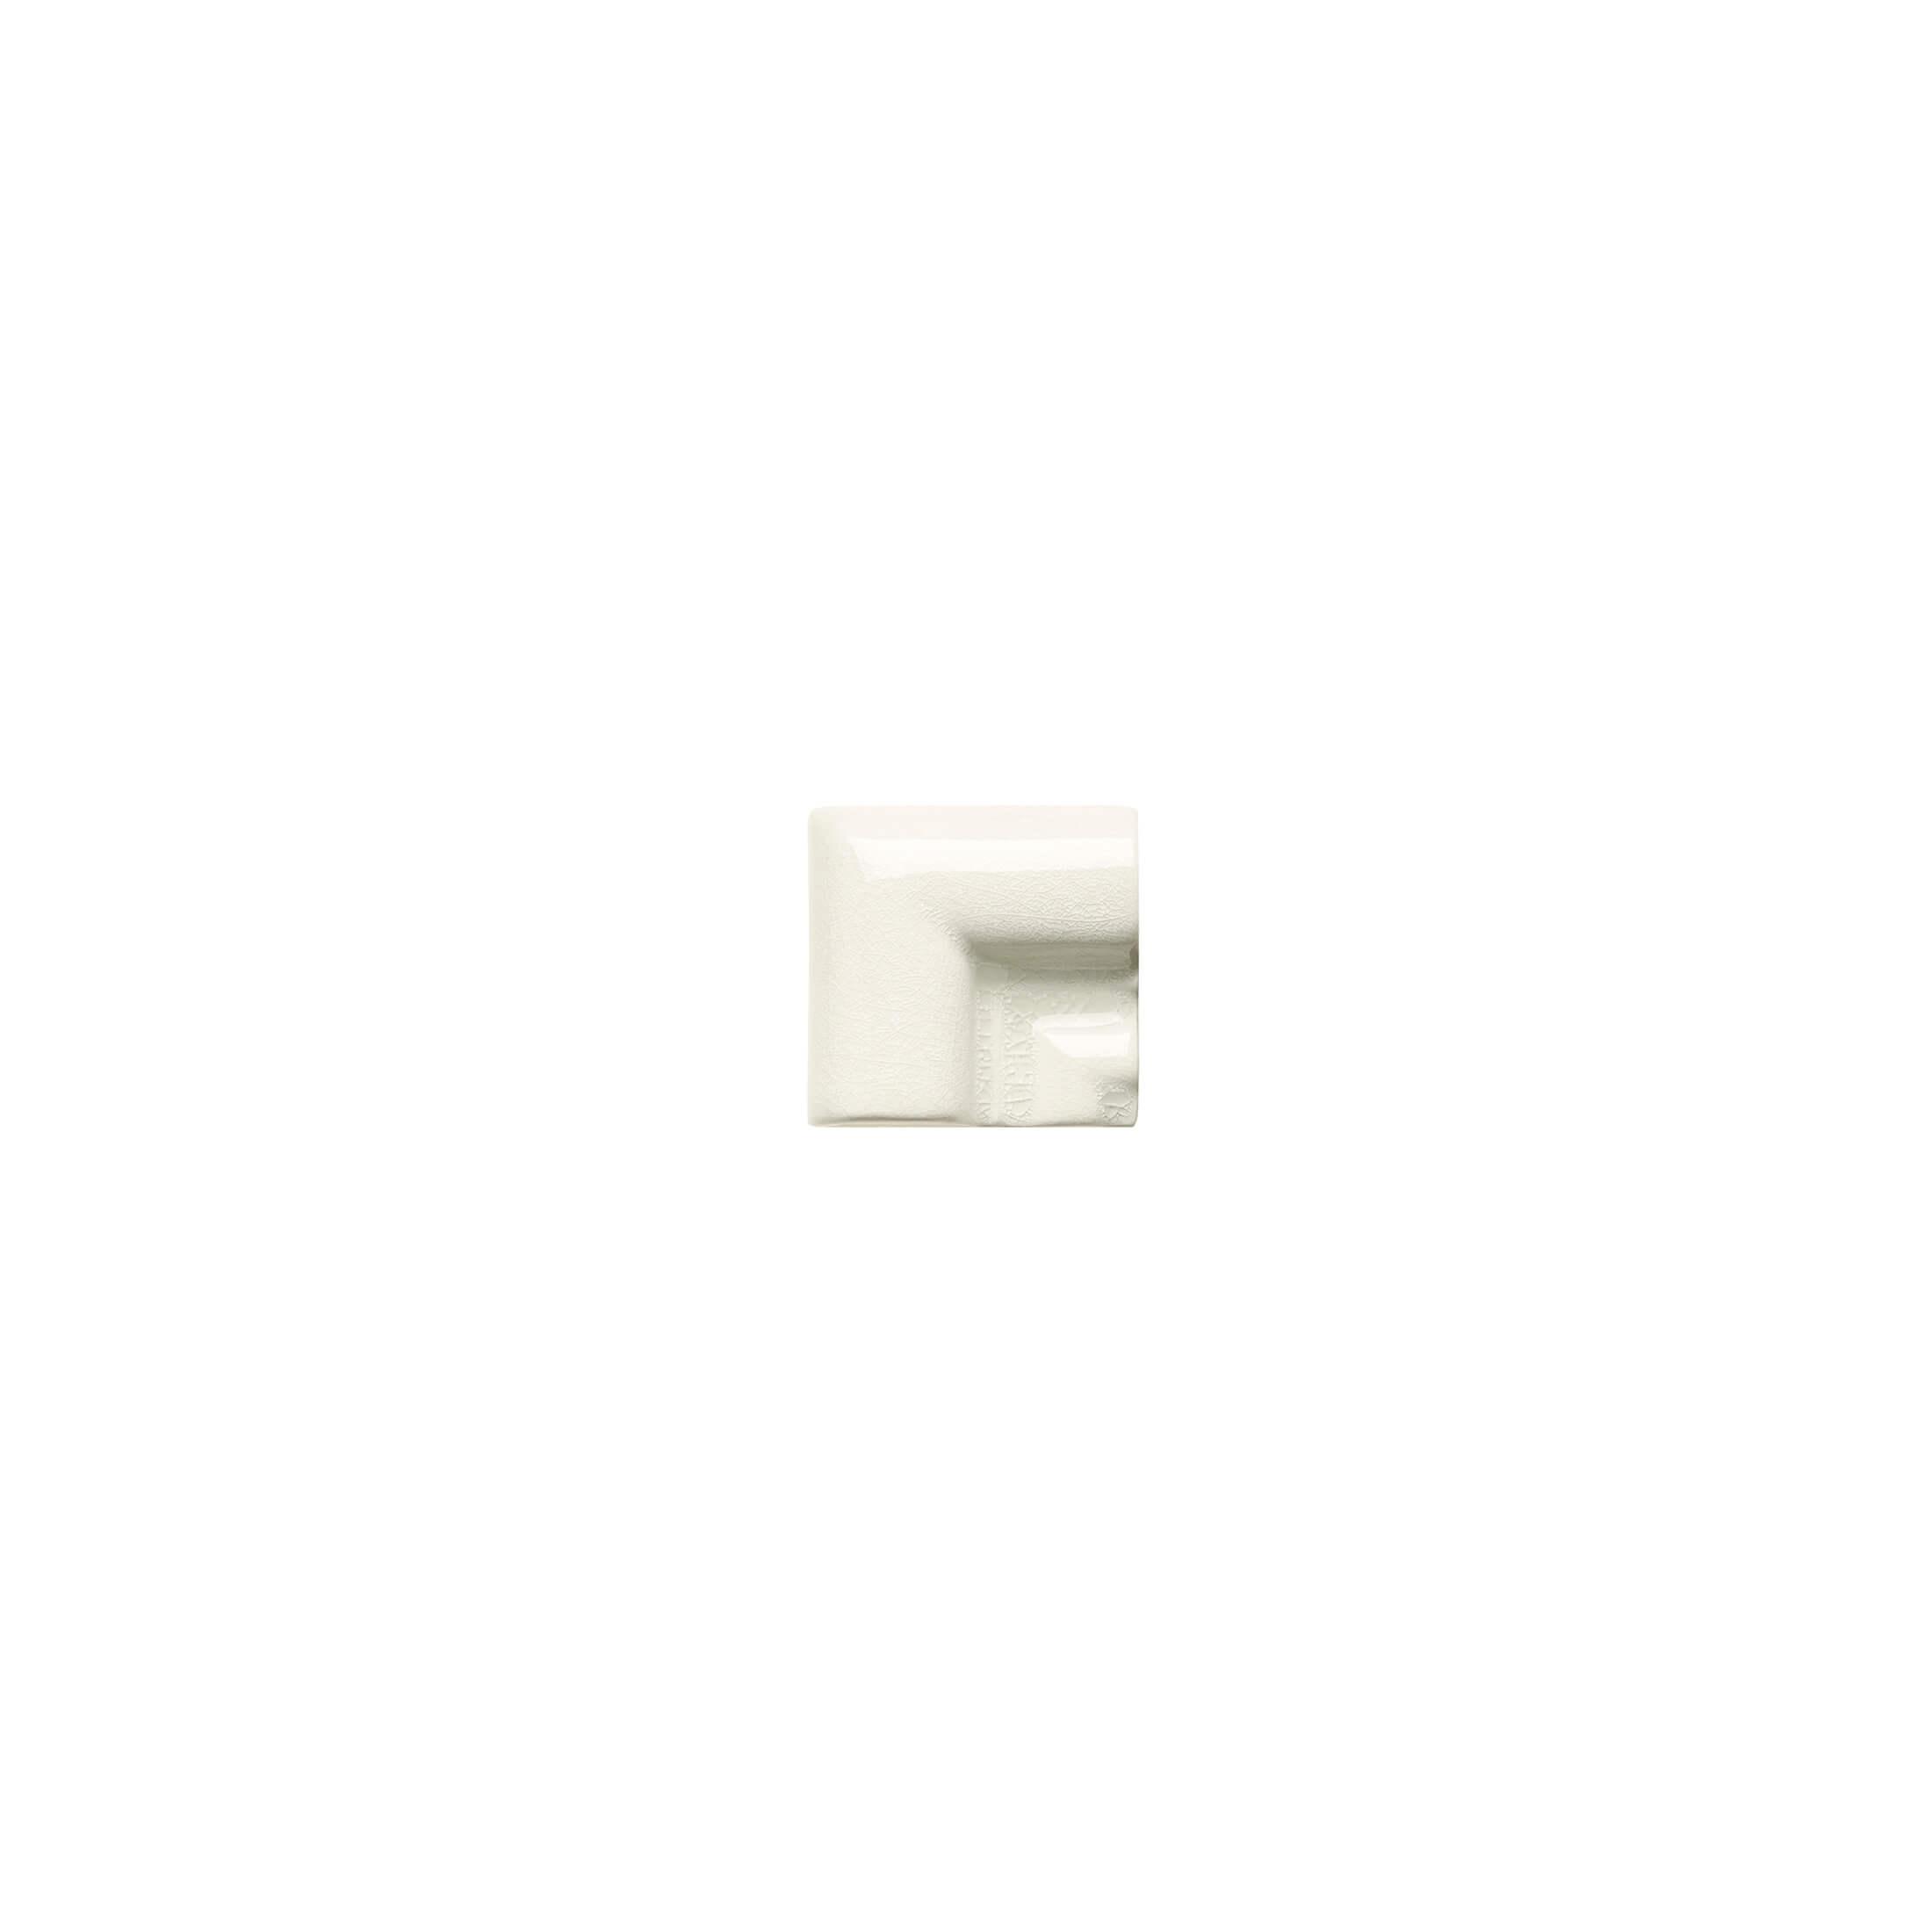 ADOC5080 - ANGULO MARCOMOLDURA - 5 cm X 15 cm